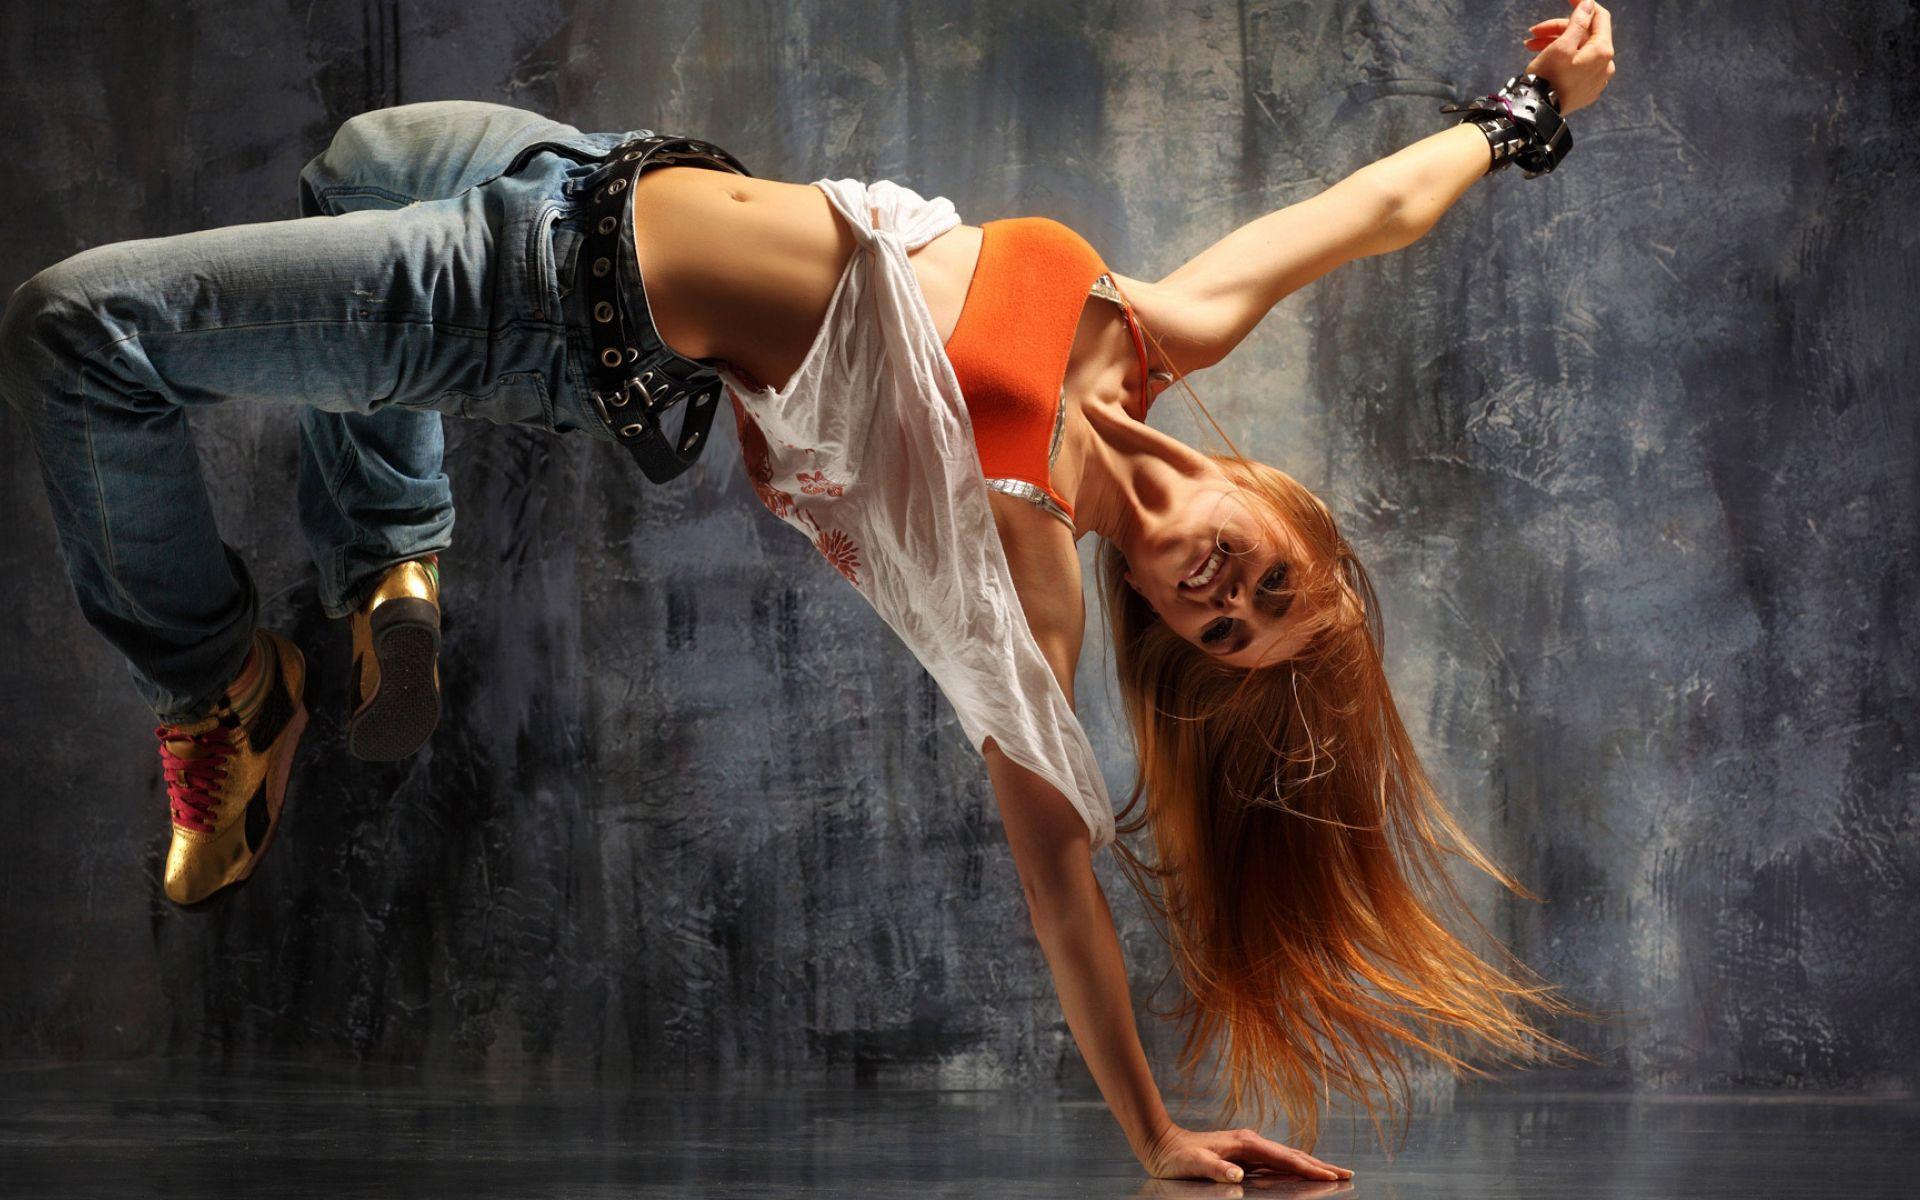 Красивые хип-хоп девушки фото